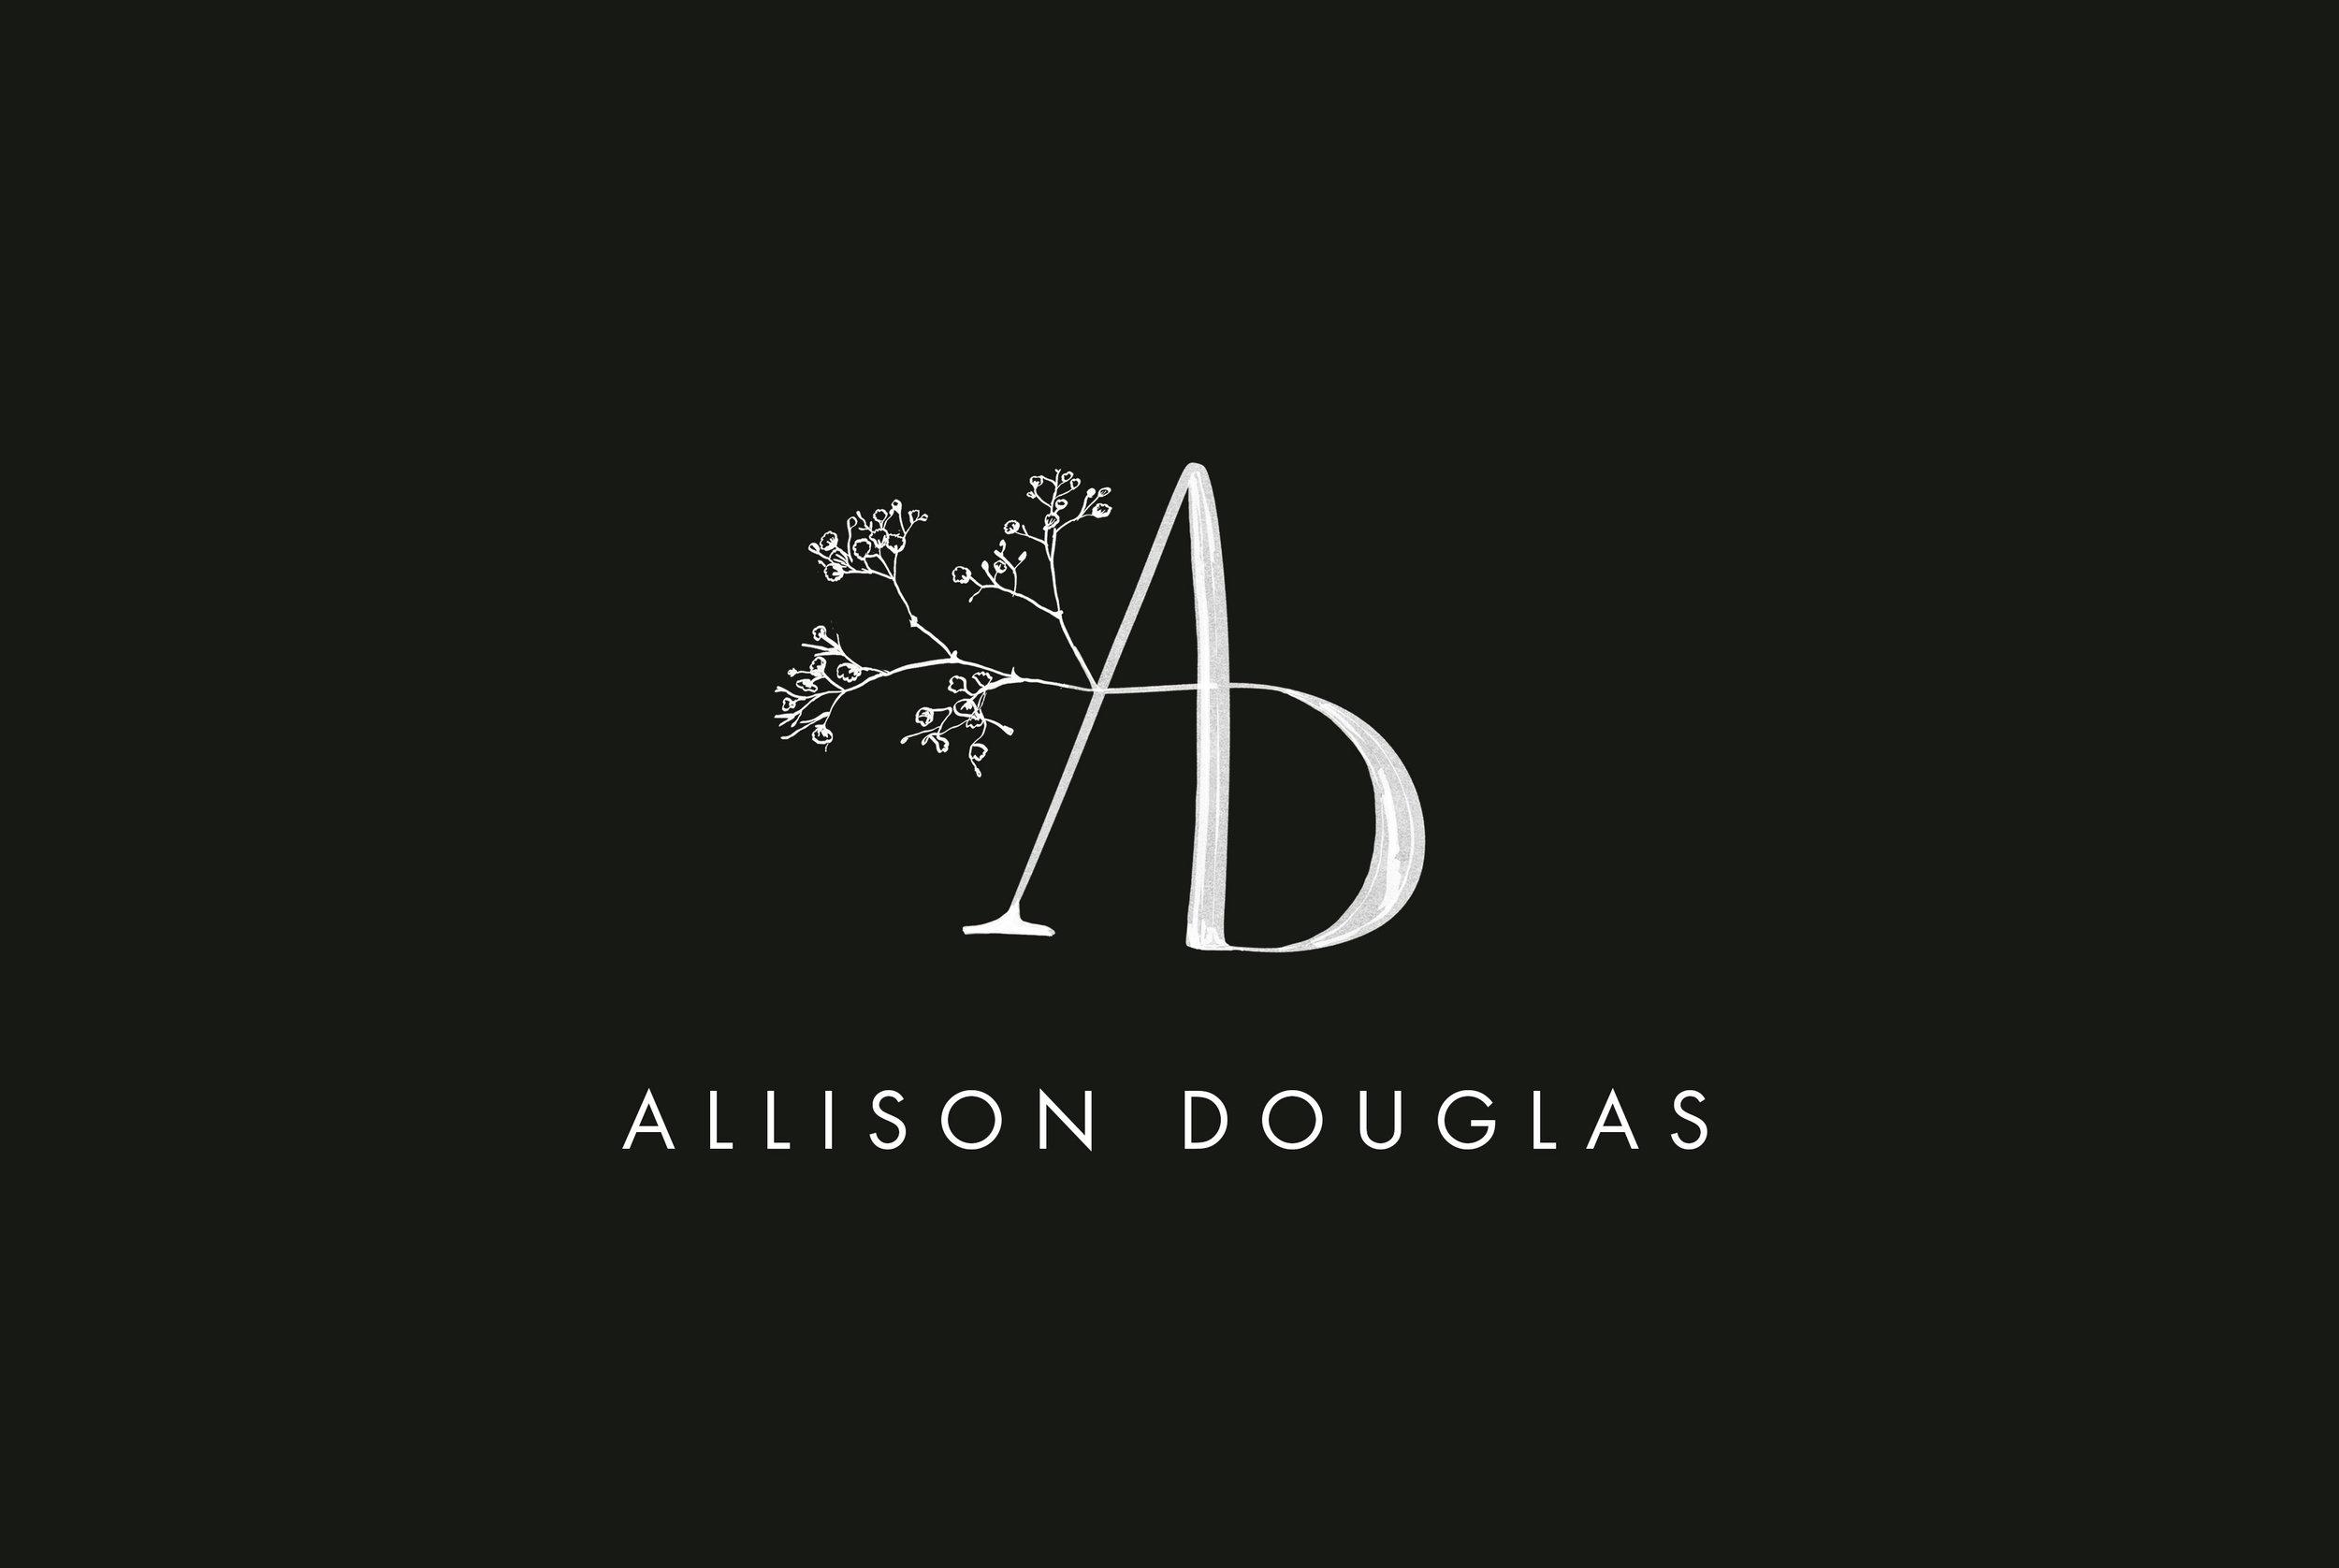 allielogodrawing2-3.jpg